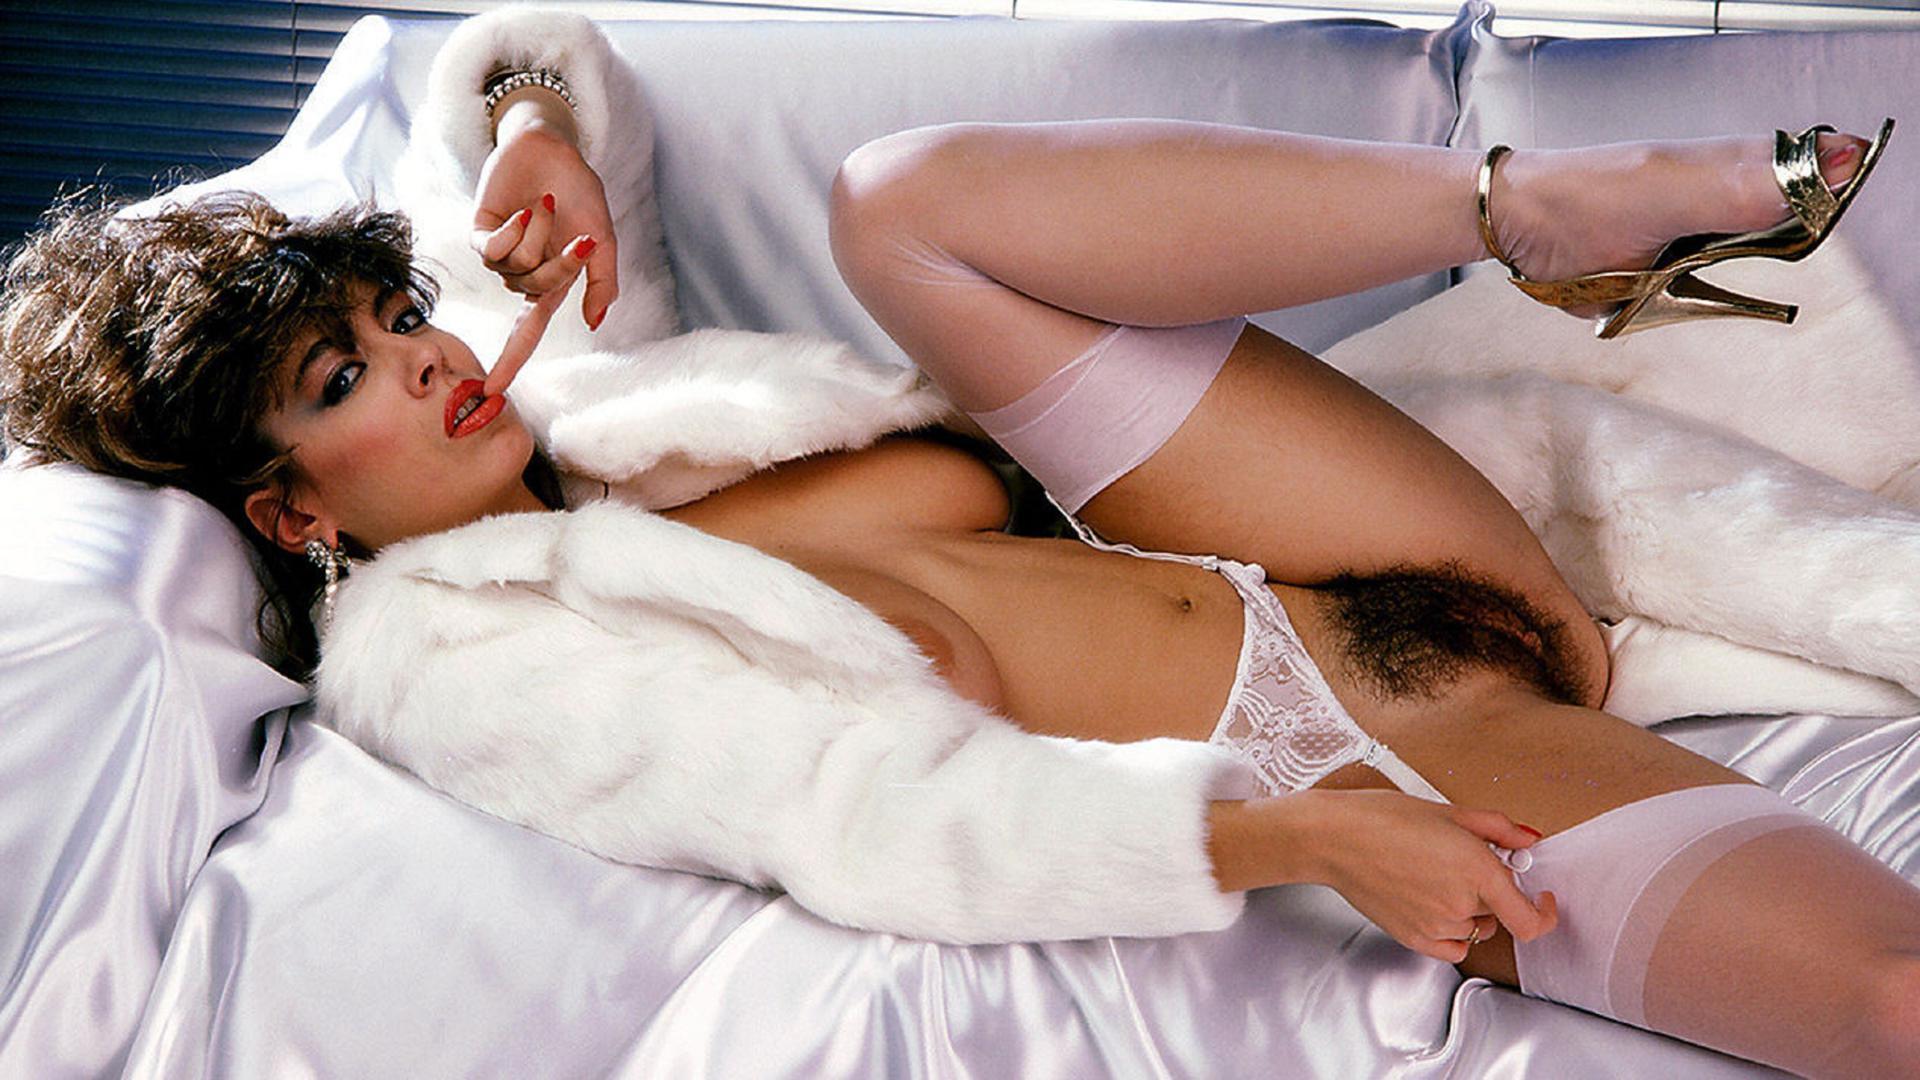 Pics of rose mcgowan bent over nude